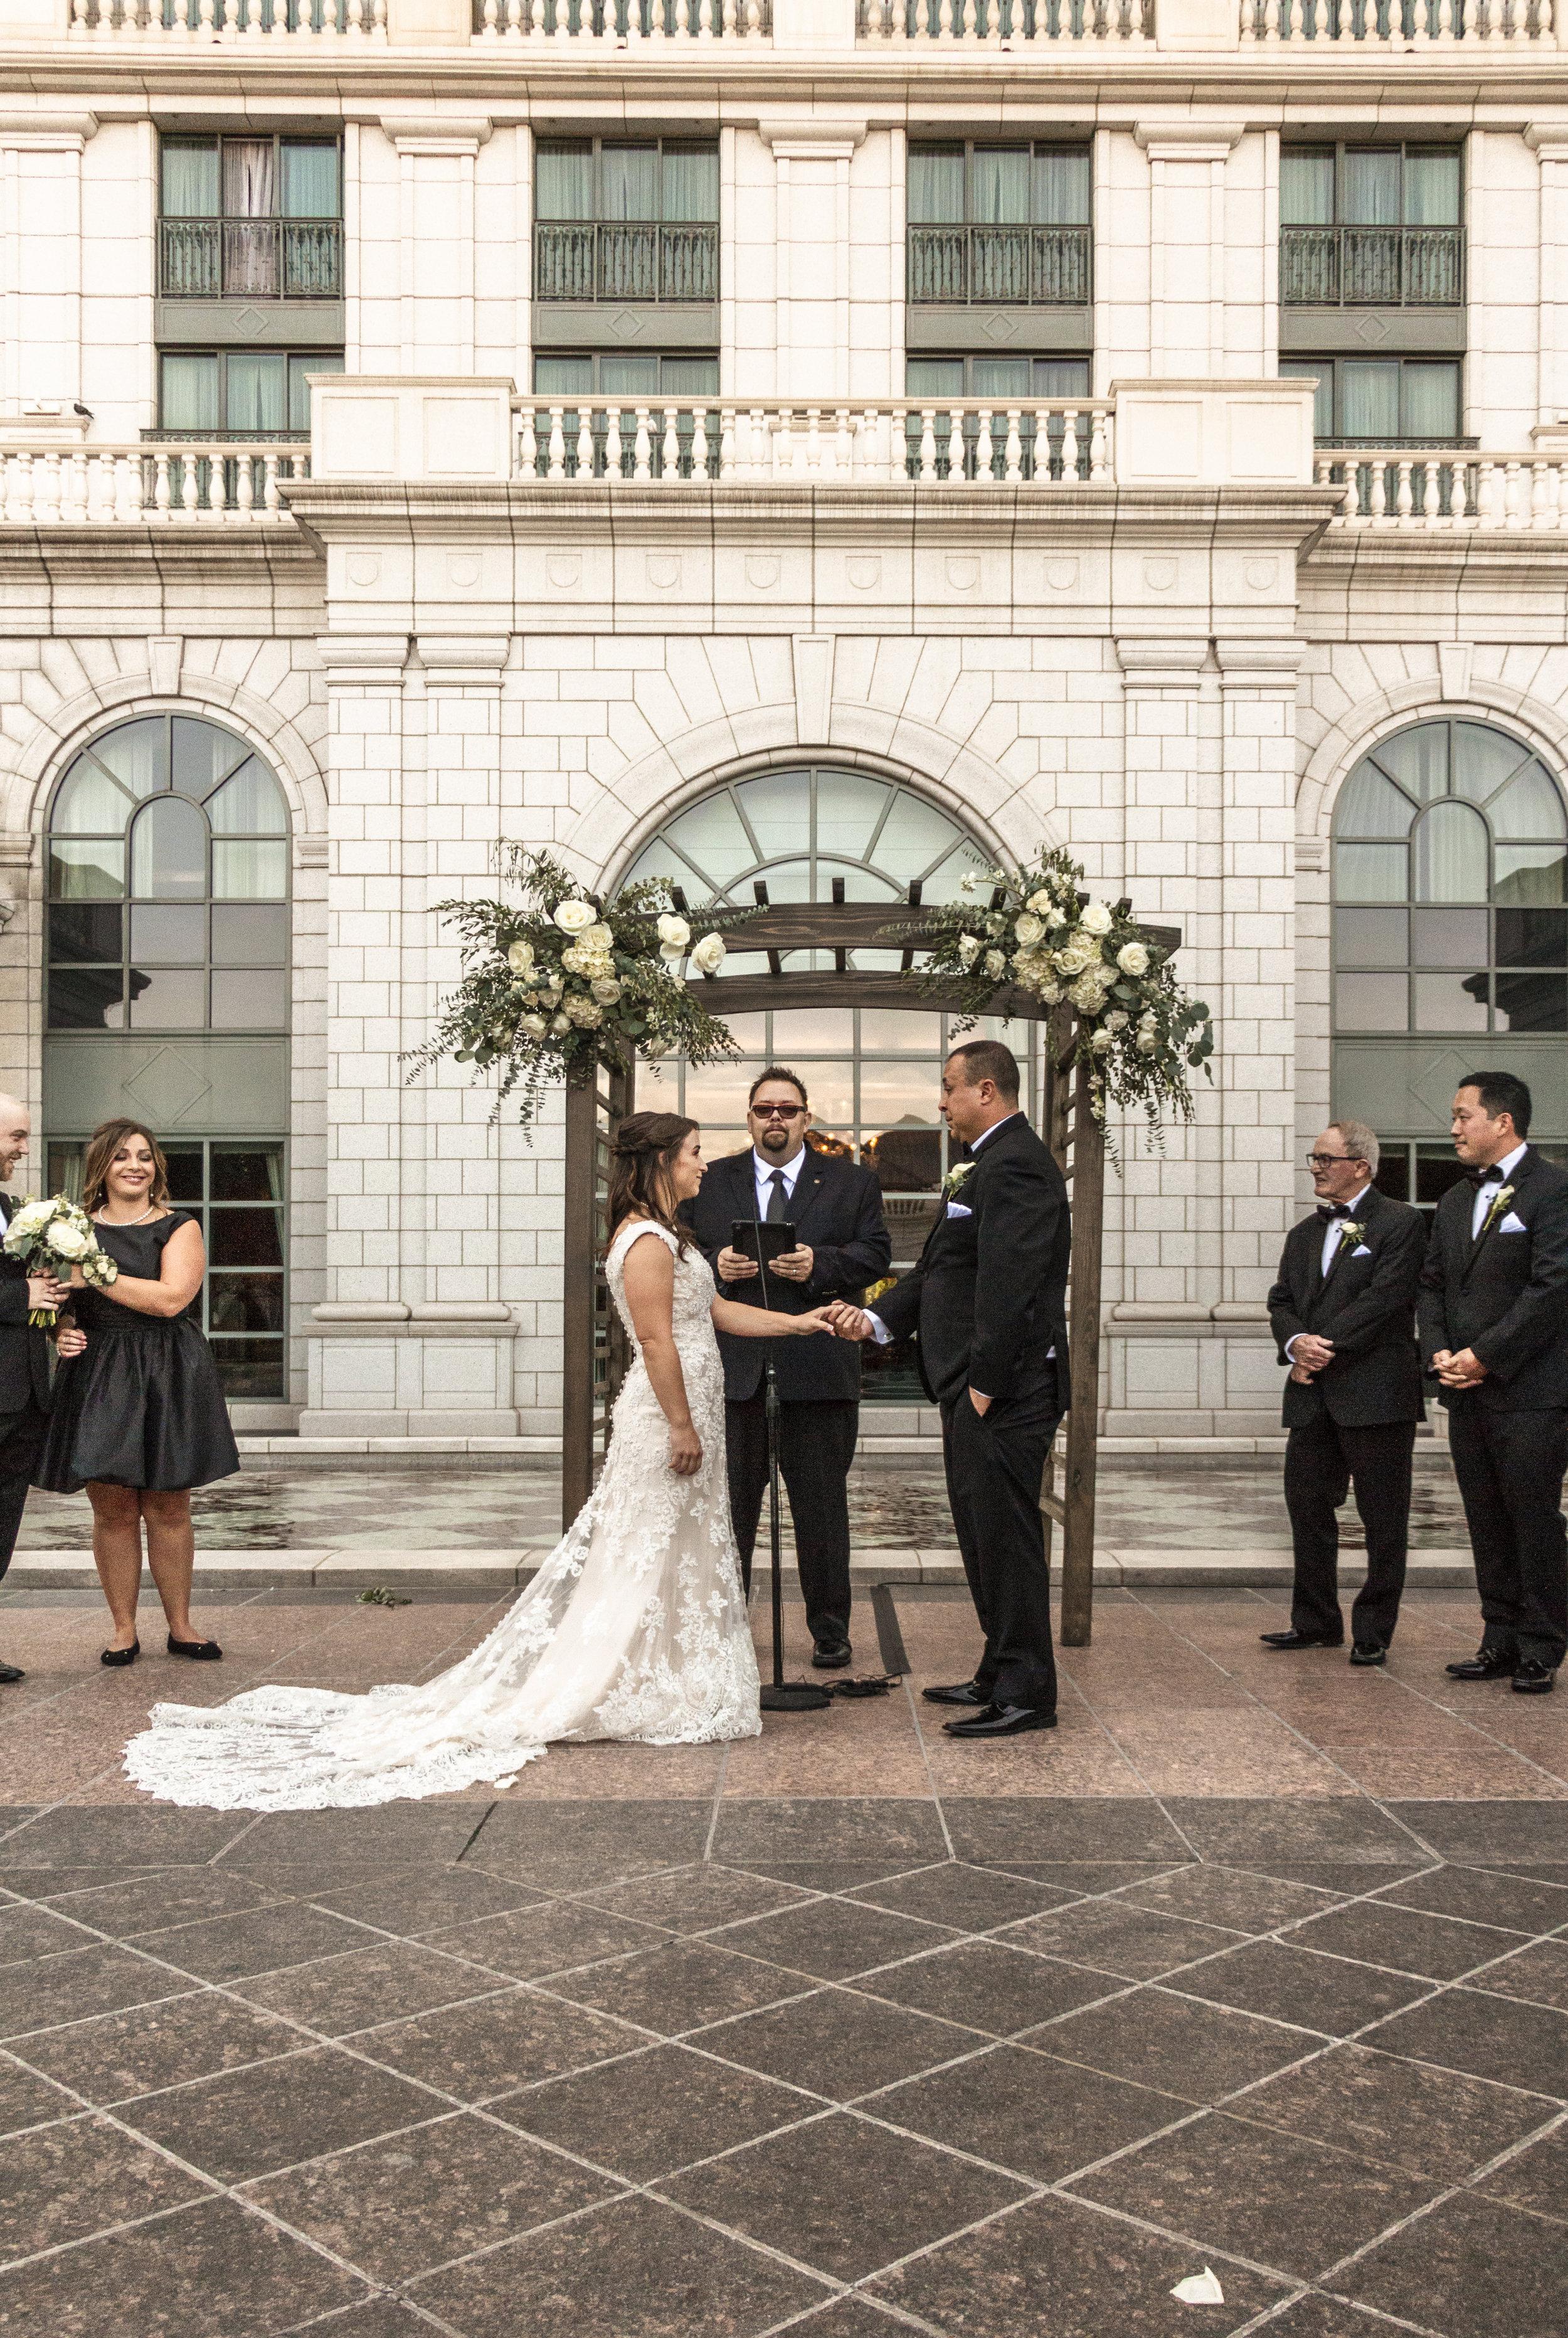 Grand America Hotel High End Wedding  Salt Lake City, Utah   Bri Bergman Photography 025.JPG